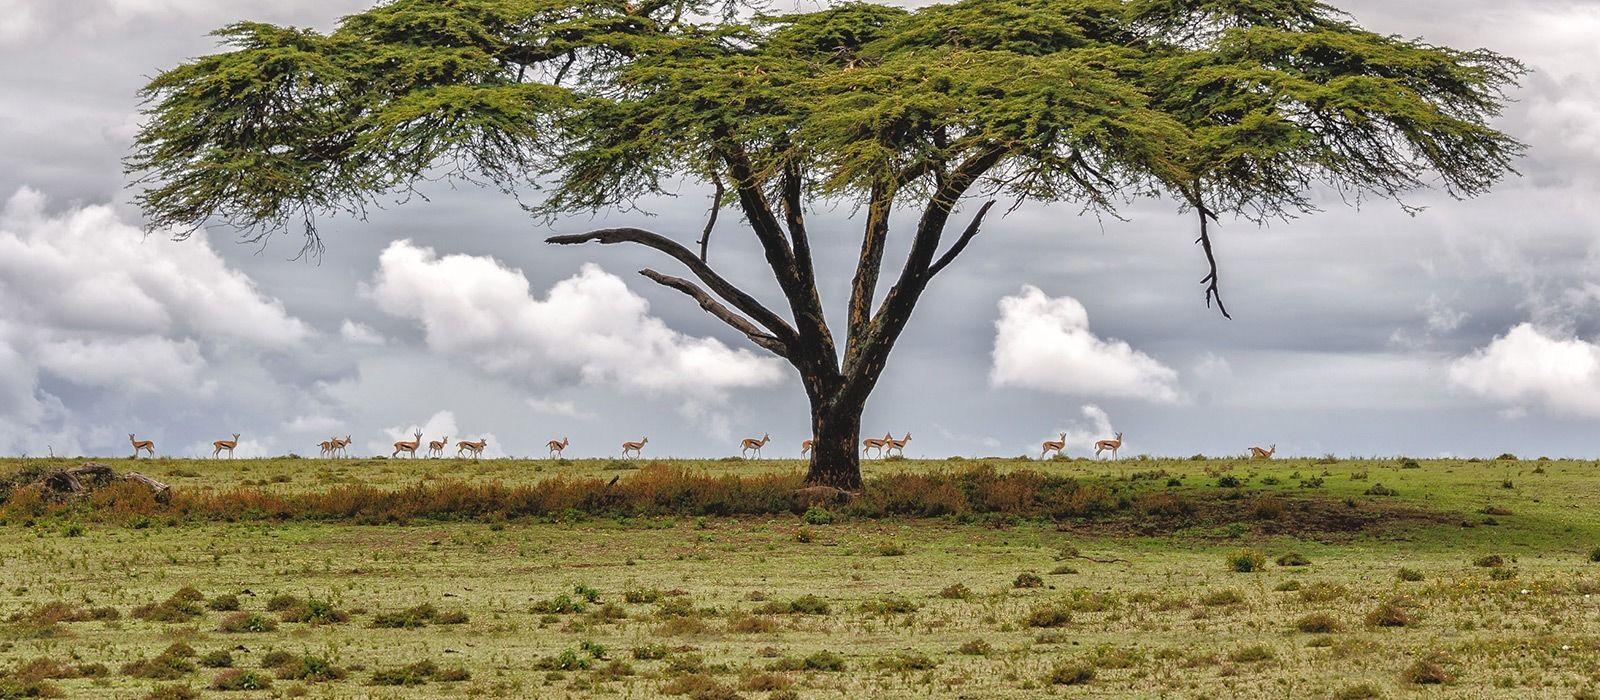 Kenia – Safari und Baden: Masai Mara & Traumstrände Urlaub 1